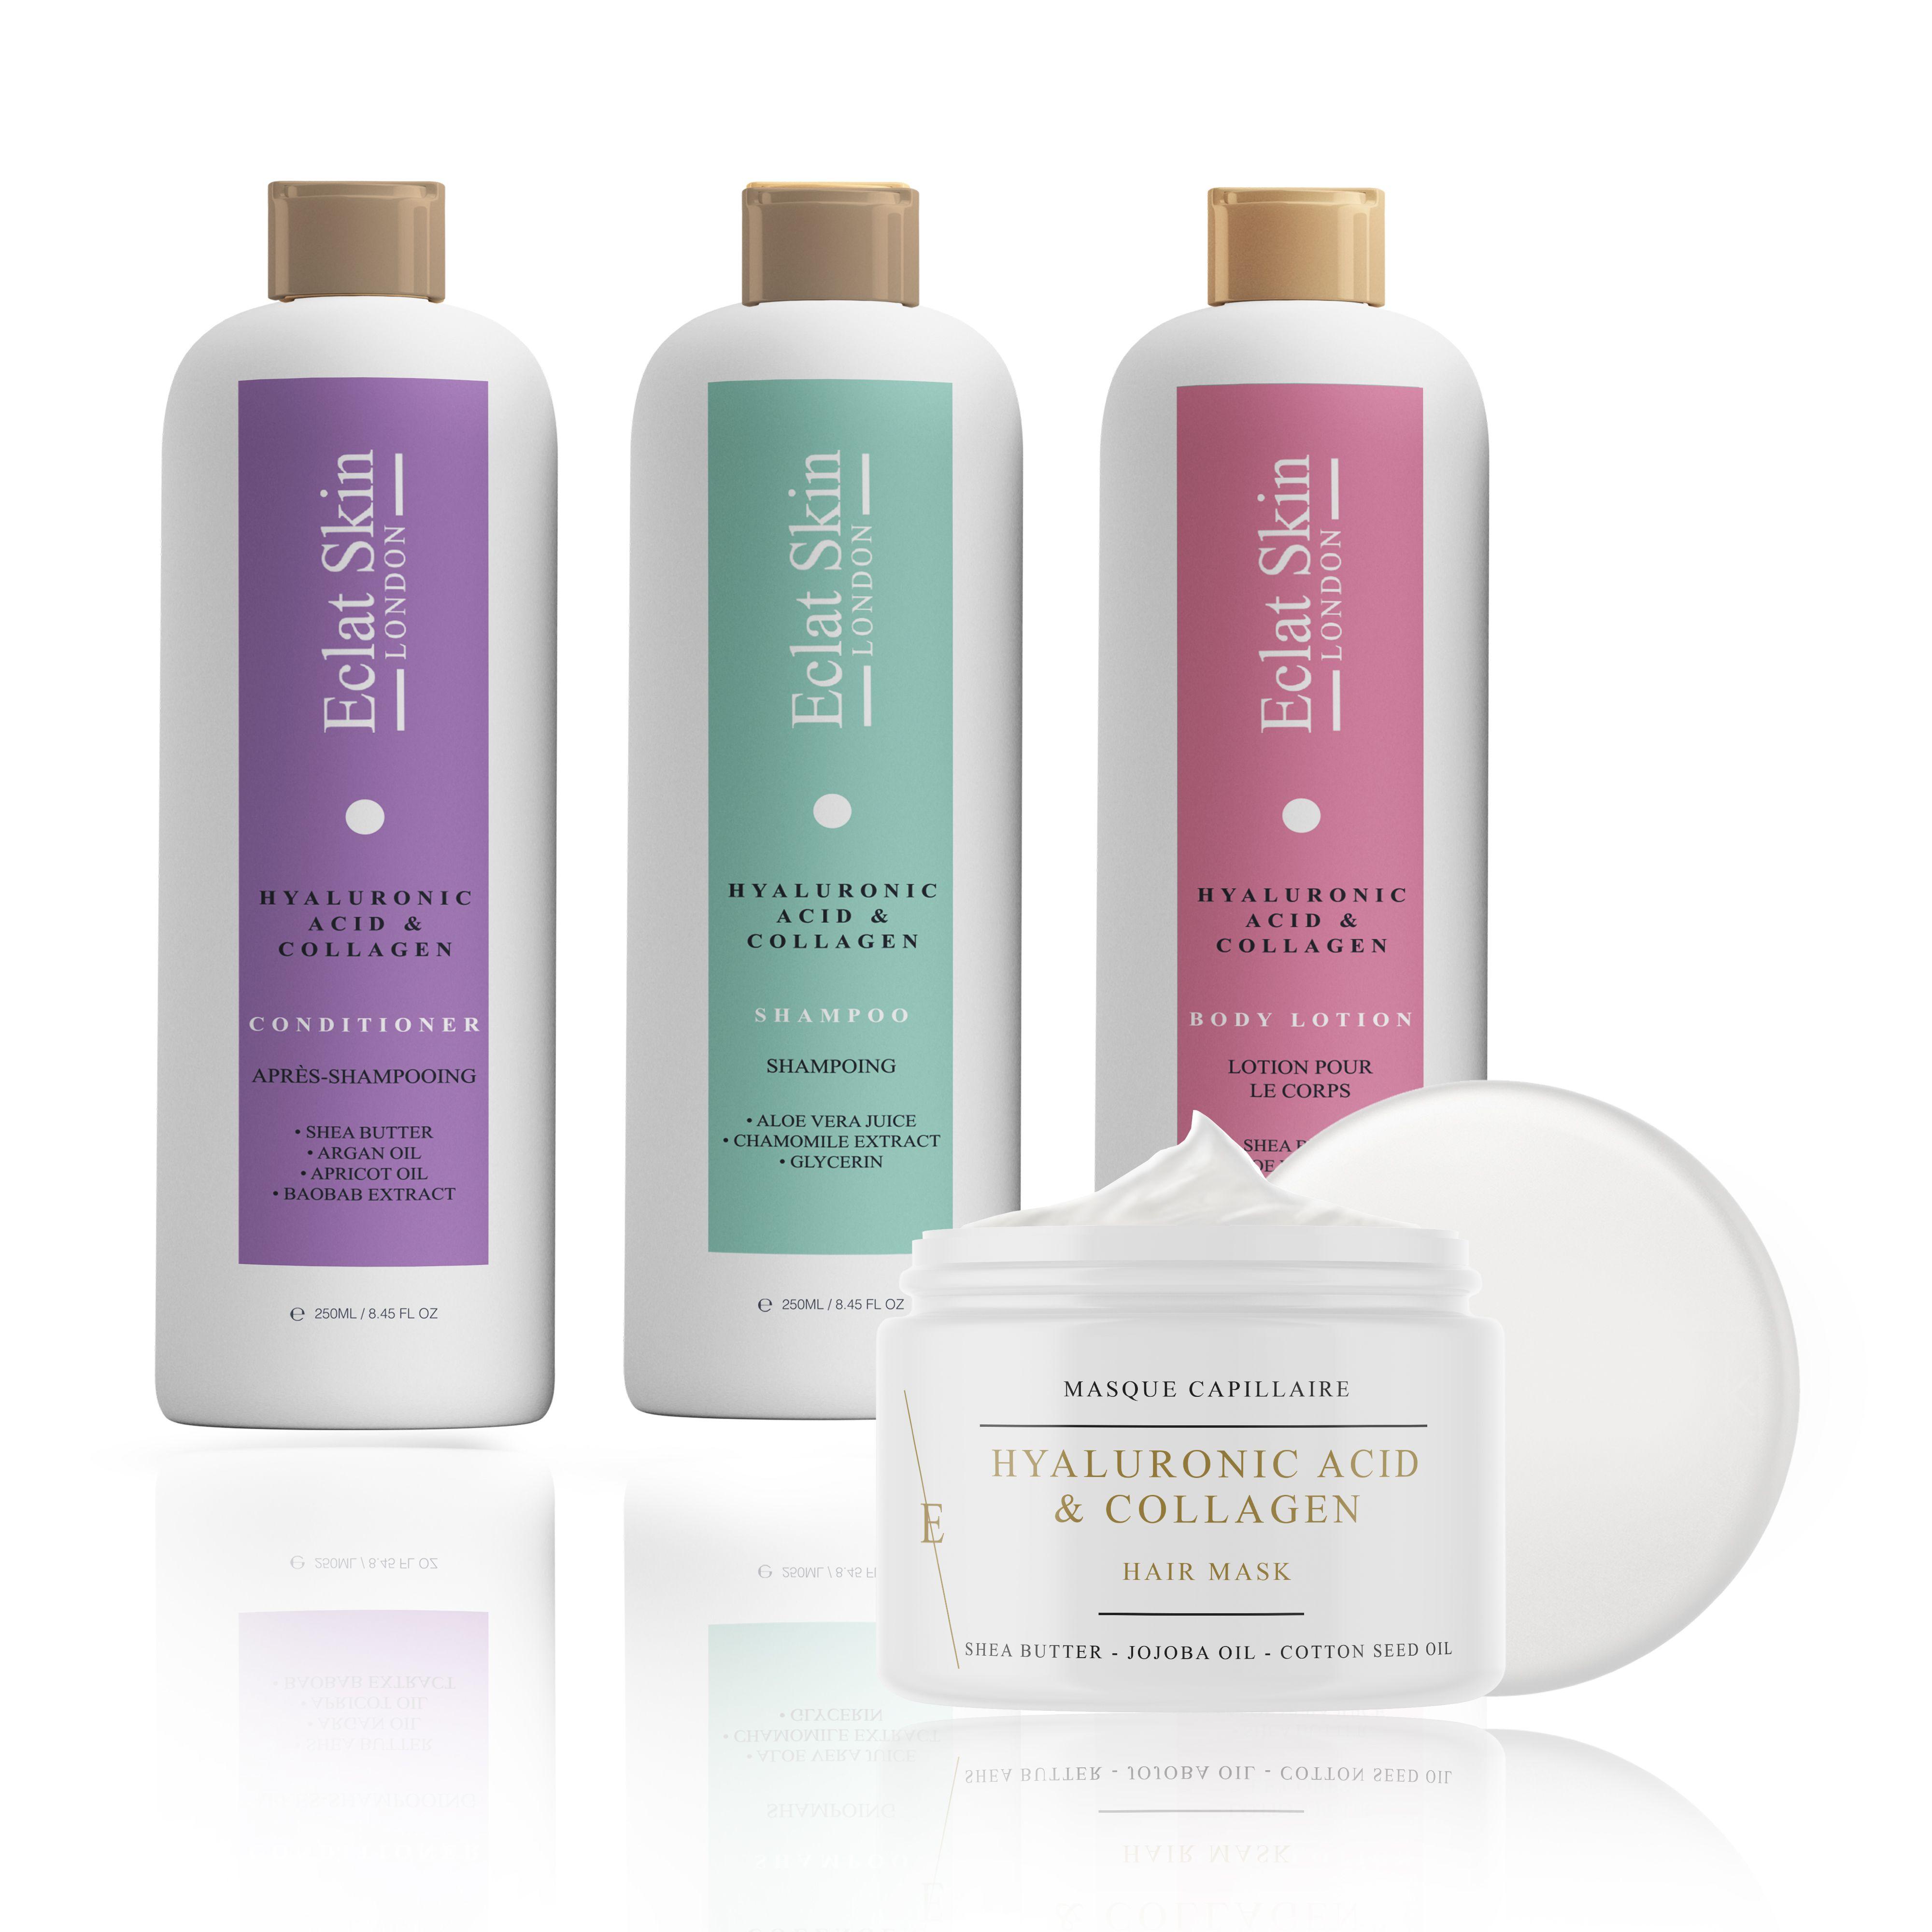 Hyaluronic Acid + Collagen Shampoo 250ml + Hyaluronic Acid + Collagen Conditioner 250ml + Hyaluronic Acid + Collagen Miracle Hair Mask 500ml + Hyaluronic Acid + Collagen Body Lotion 250ml